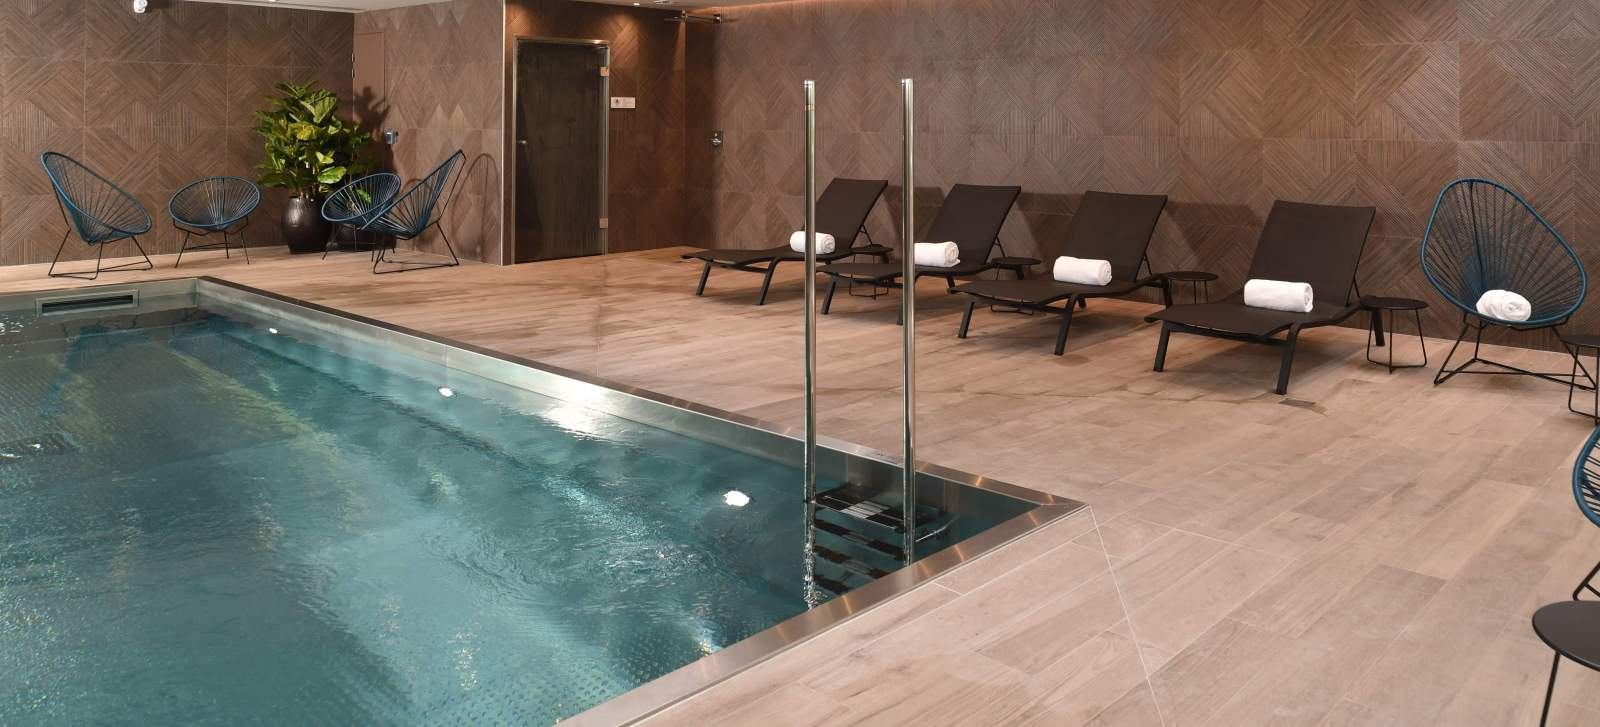 Hotel Oceania St Malo - Hotel 4 etoiles Saint Malo (16).jpg